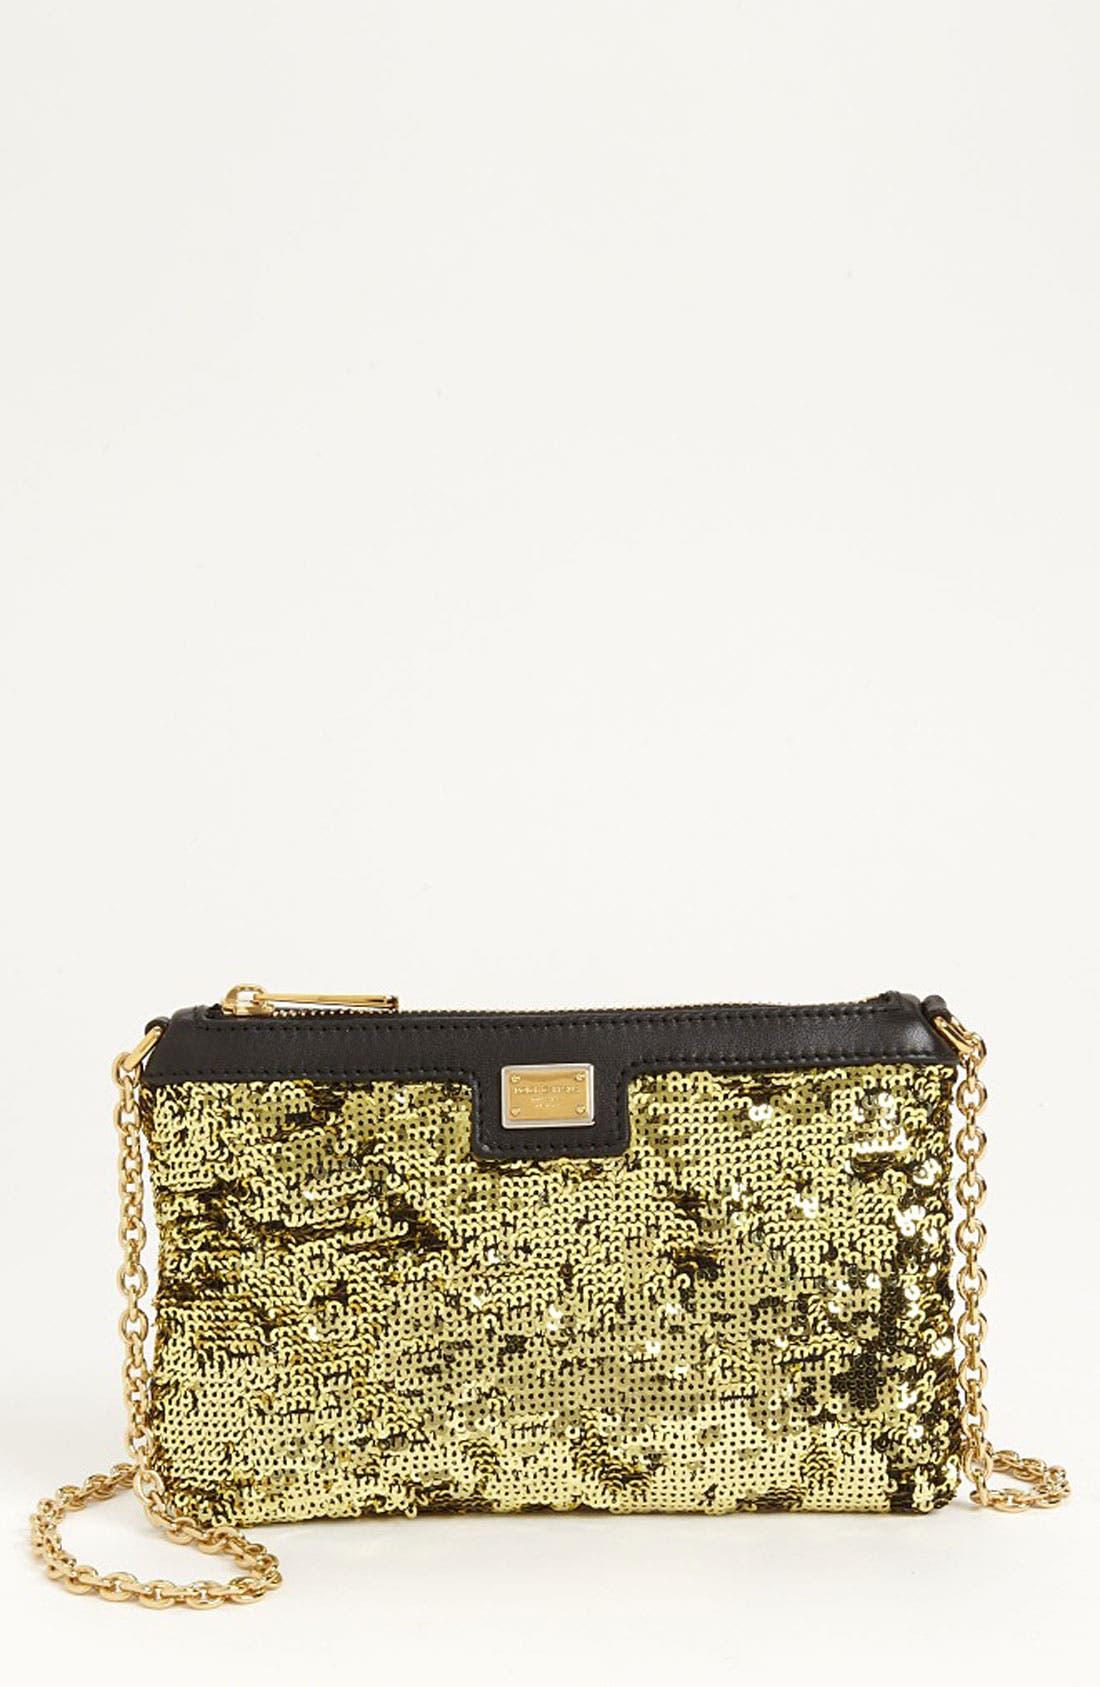 Main Image - Dolce&Gabbana 'Miss Mini' Sequin Crossbody Bag